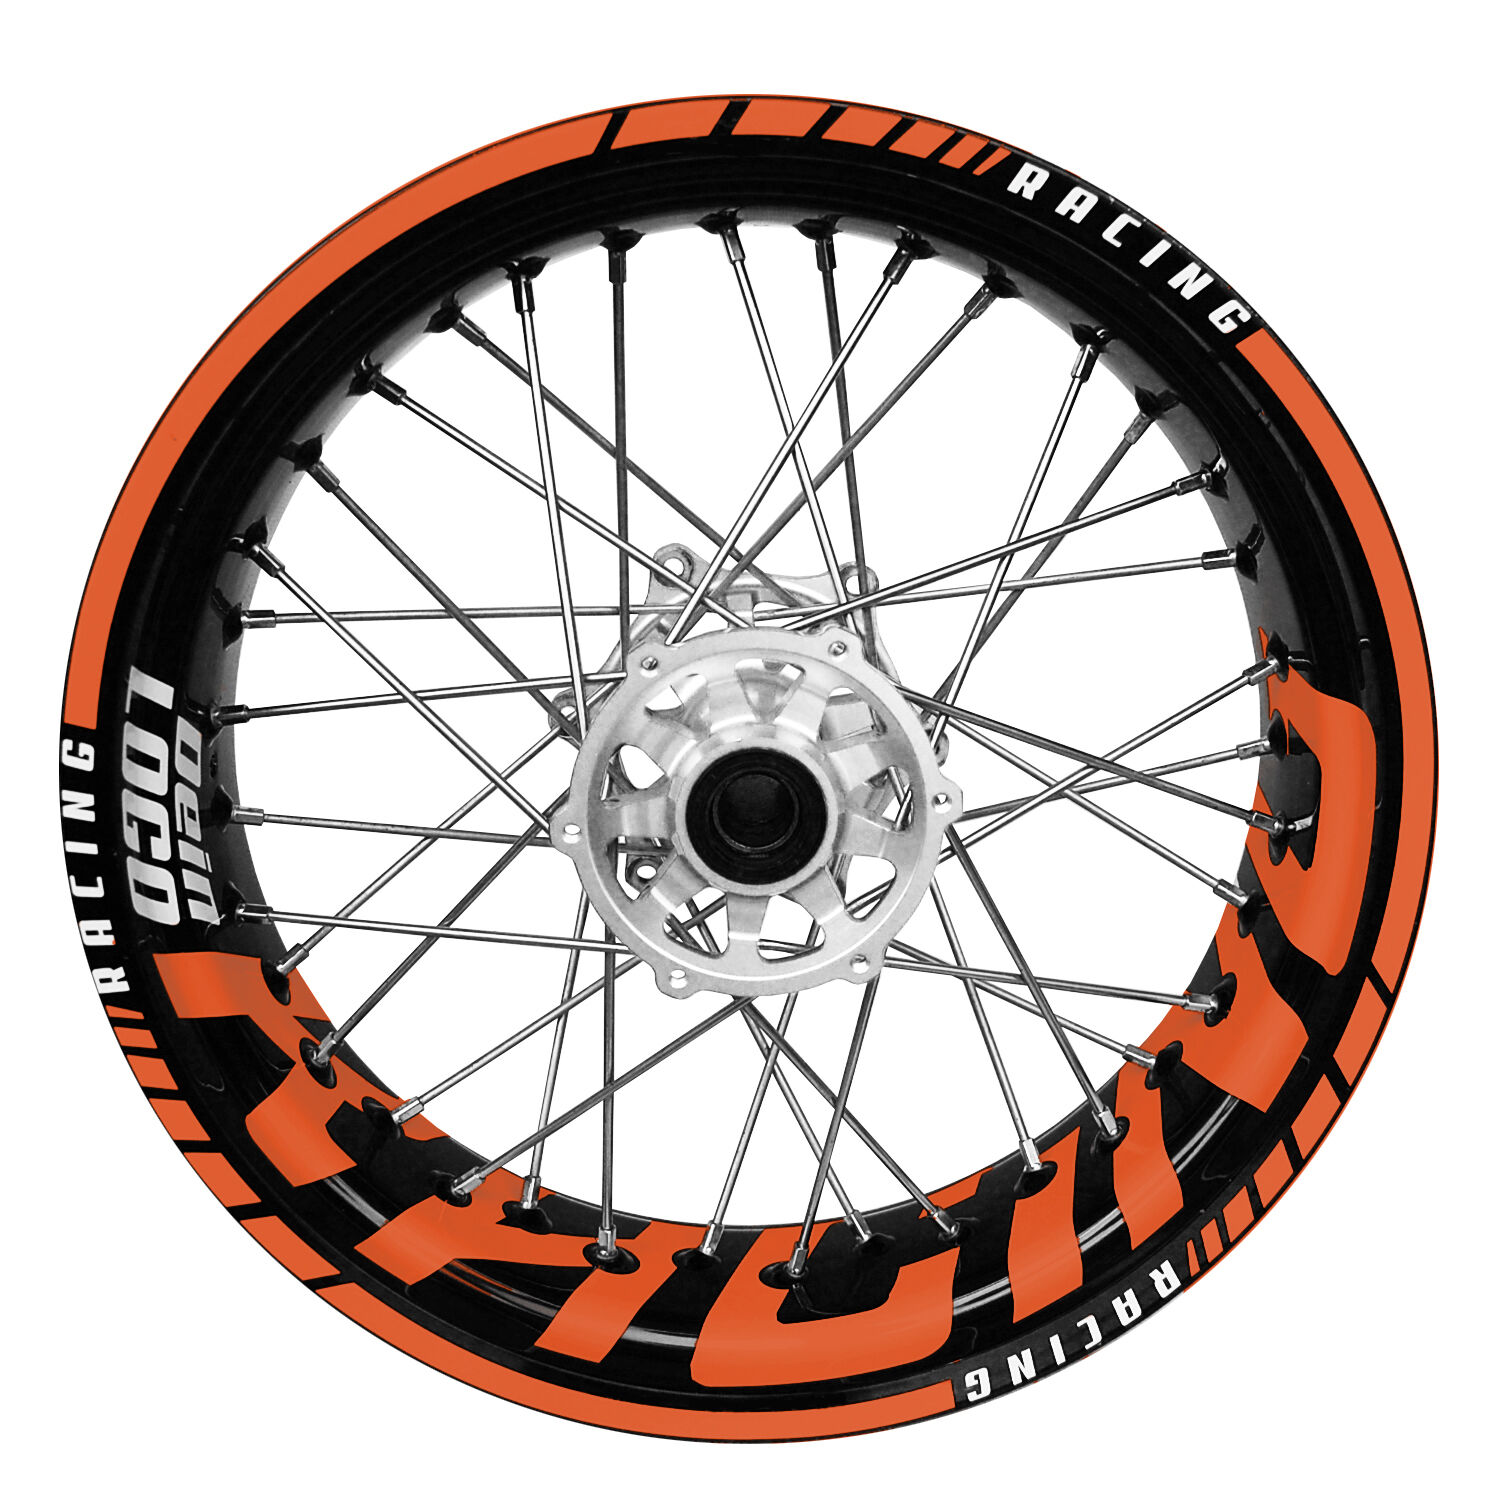 supermoto orangeracing logo felgenaufkleber motorrad